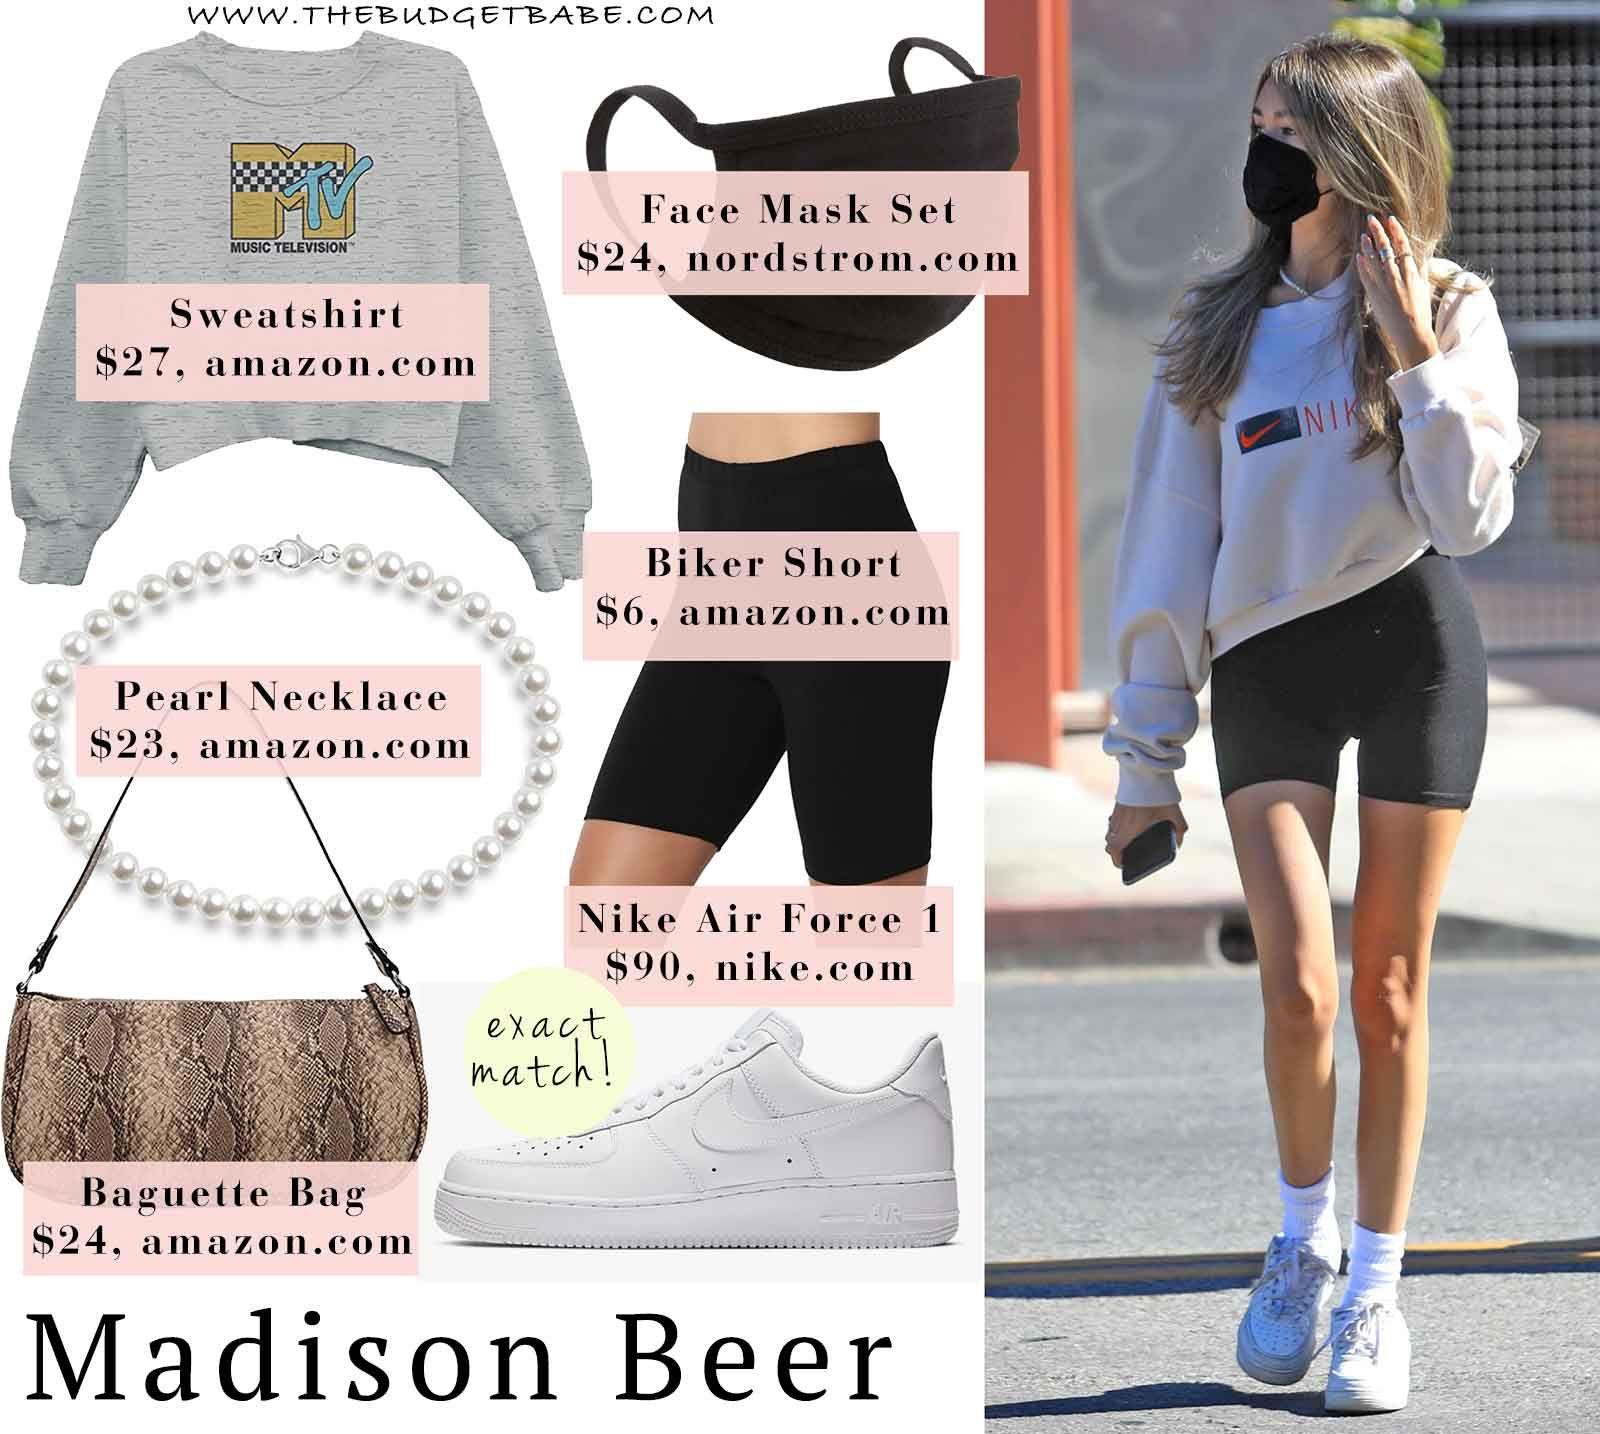 Madison Beer S Nike Sweatshirt And Biker Shorts Biker Shorts Nike Sweatshirts Celebrity Look [ 1434 x 1600 Pixel ]